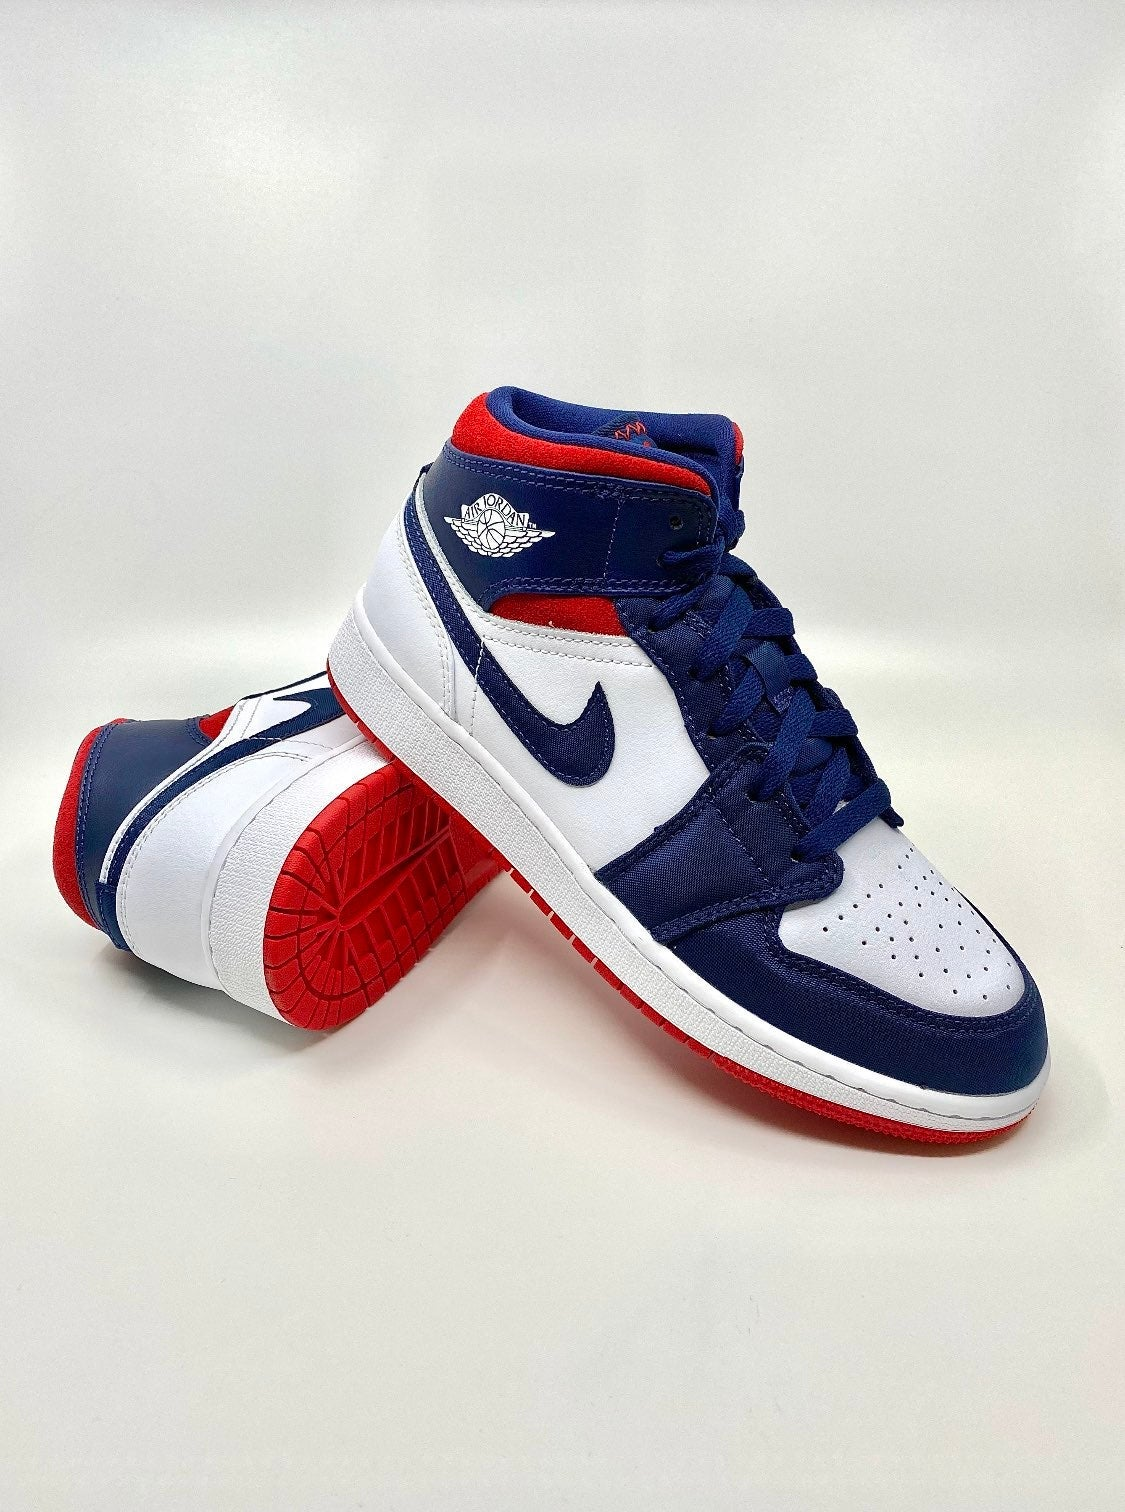 Nike Air Jordan 1 Mid USA Olympic 5.5Y